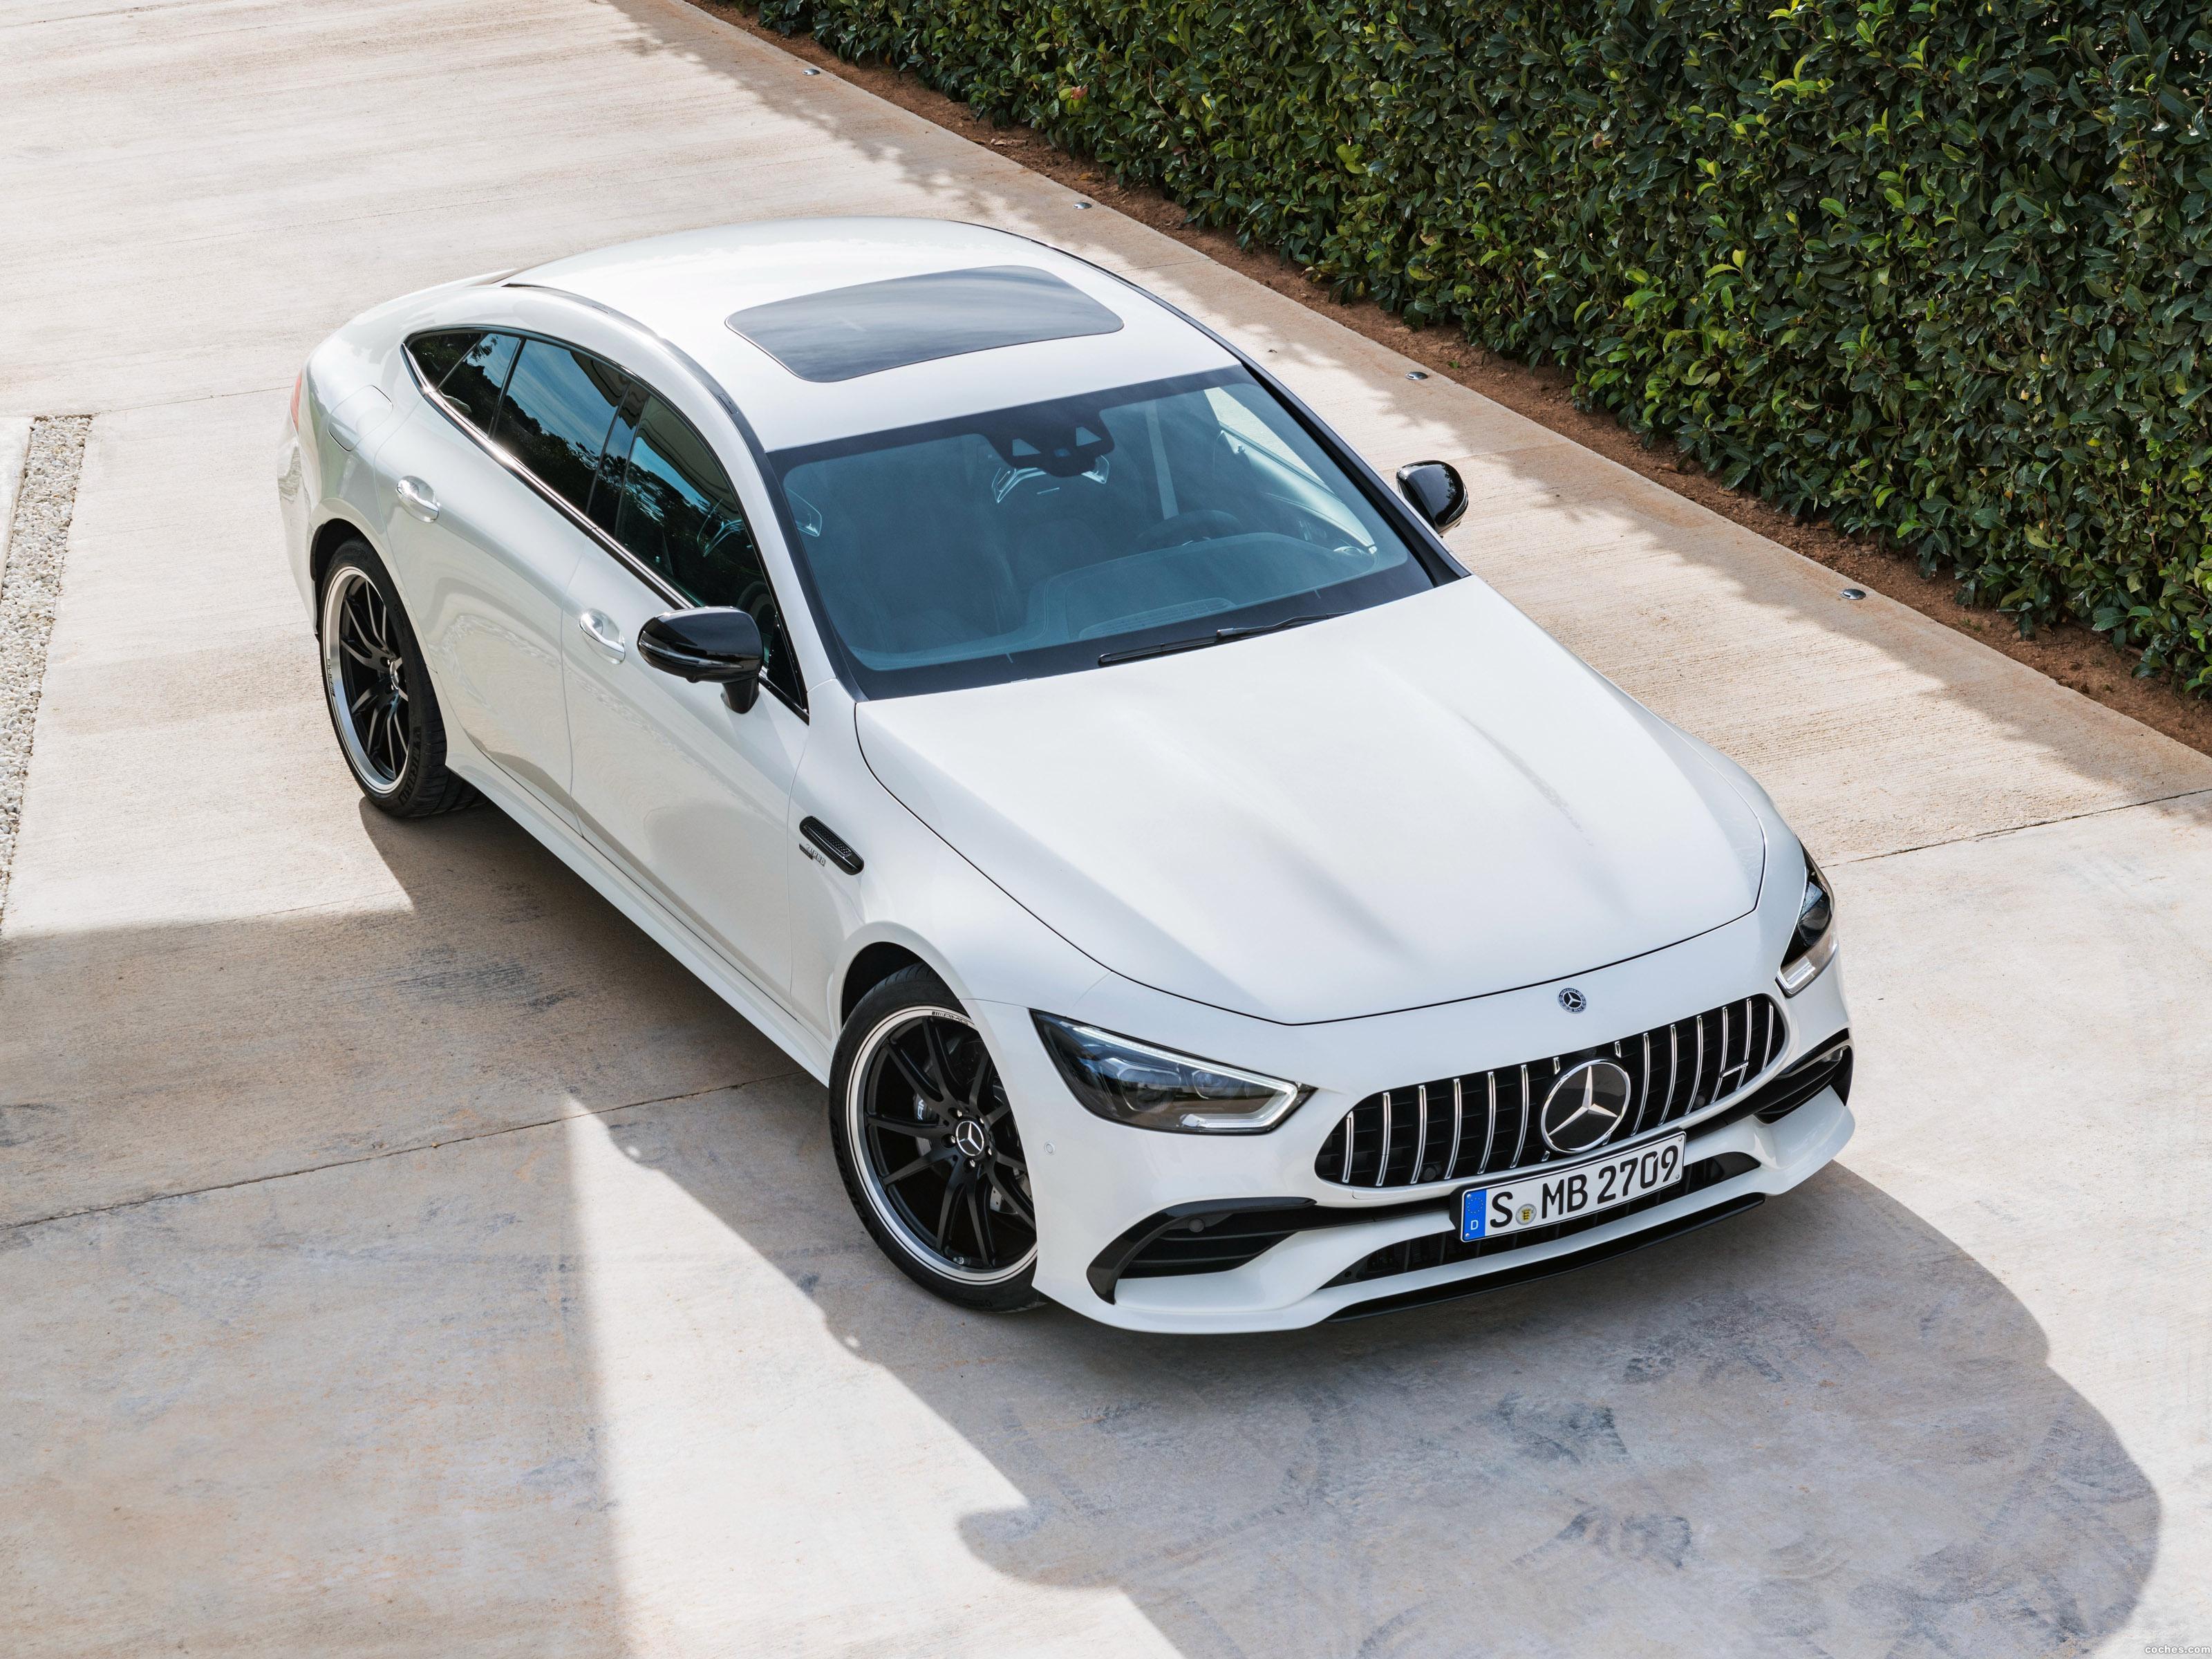 amg_mercedes-gt53-4matic-plus-4-door-coupe-2018_r27.jpg